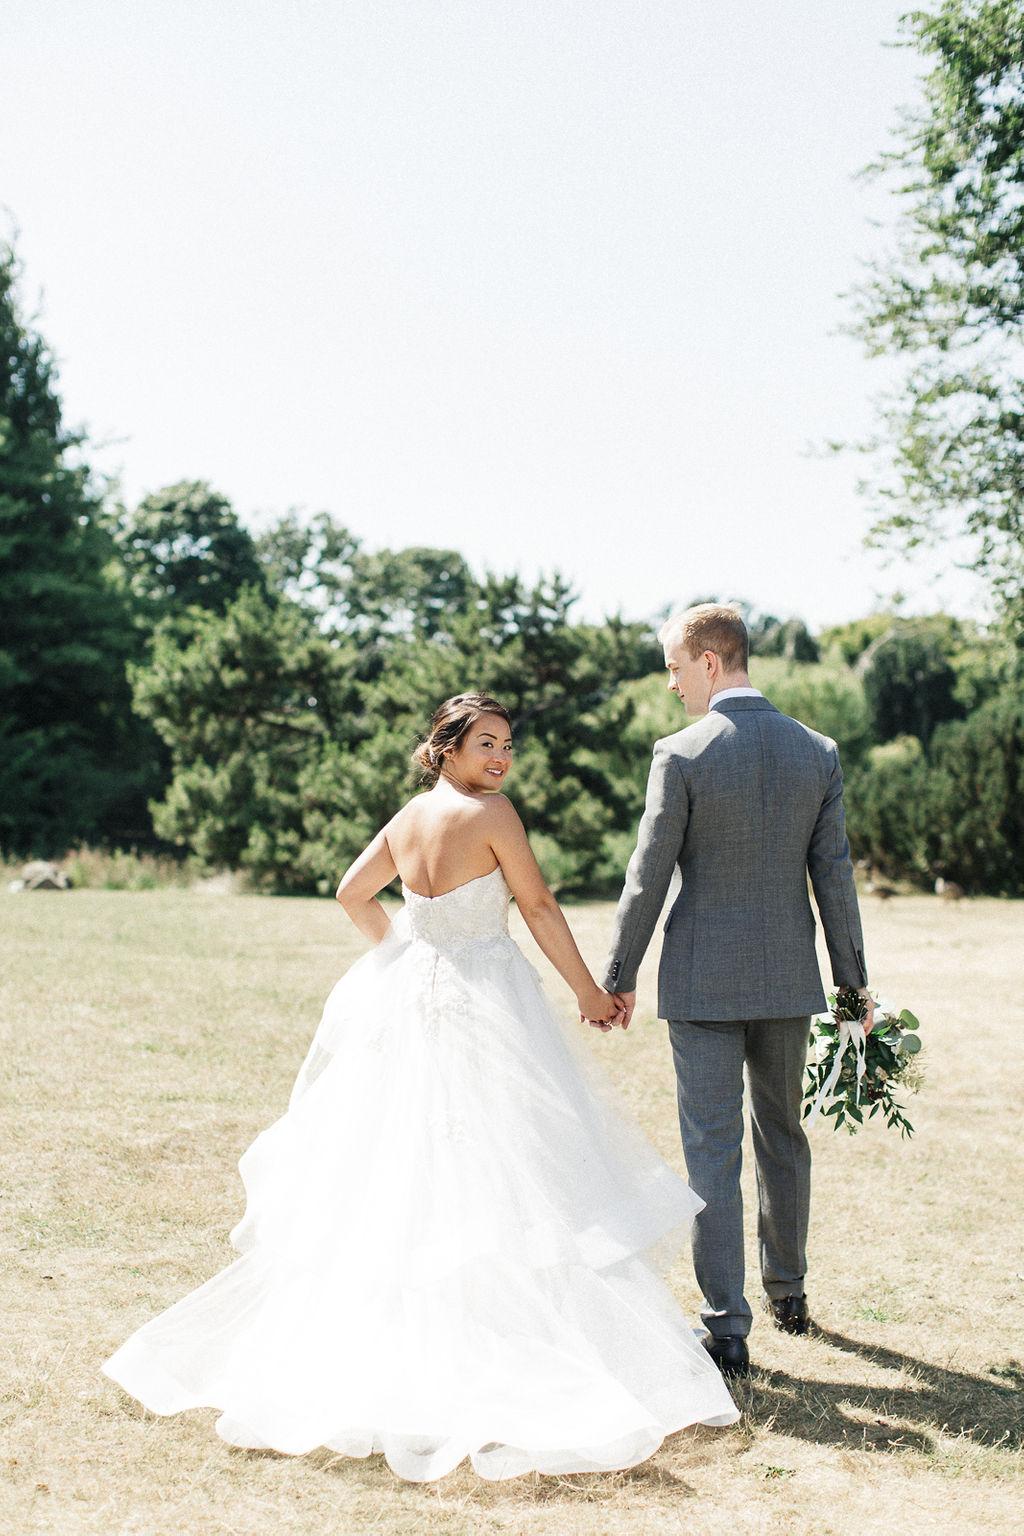 Andrea_Chris_Musuem_of_Anthropology_Wedding-823-2.jpg